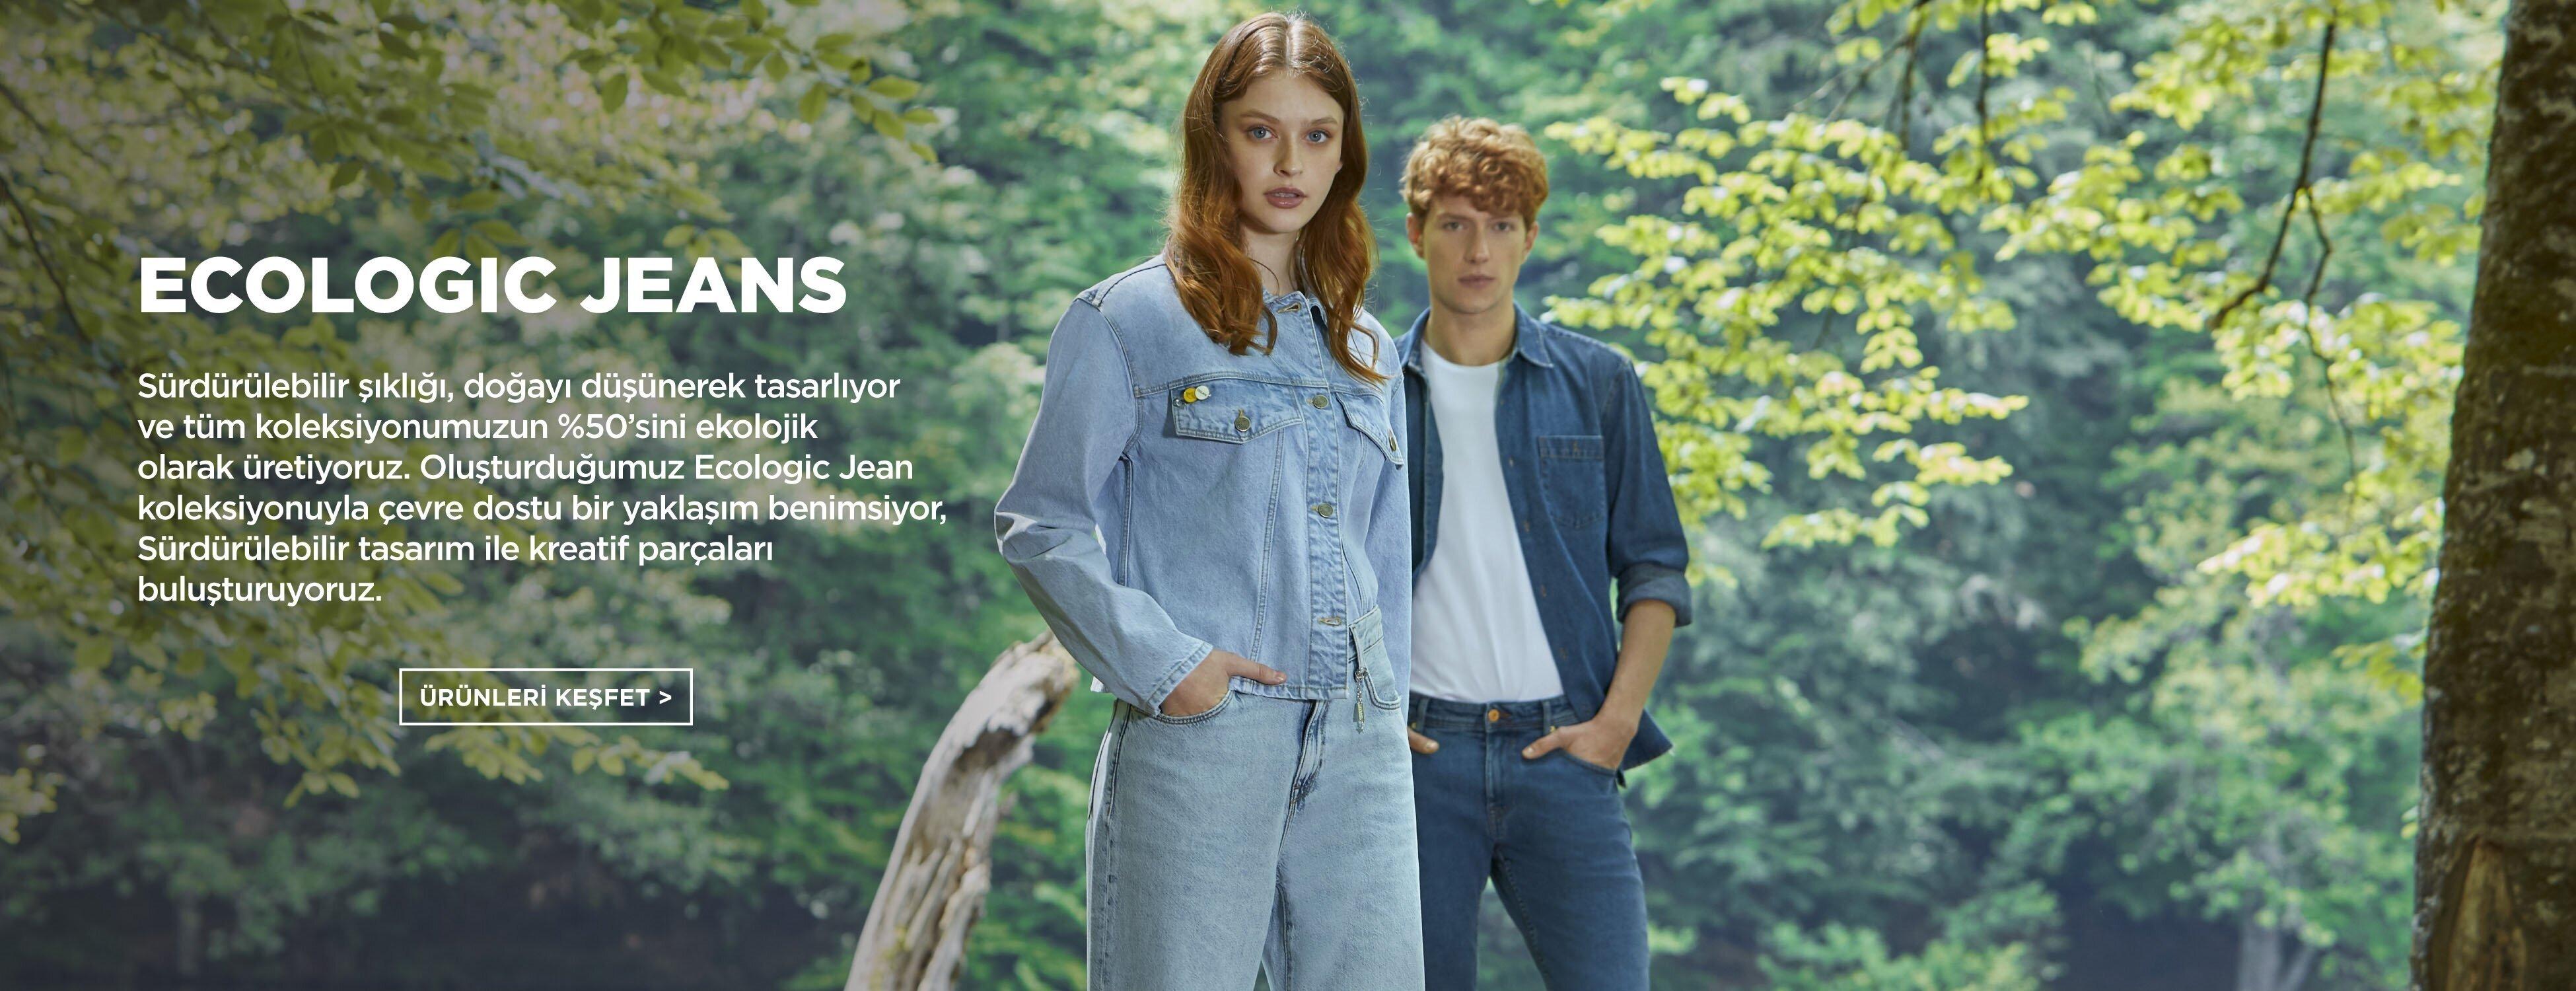 Ecologic Jeans